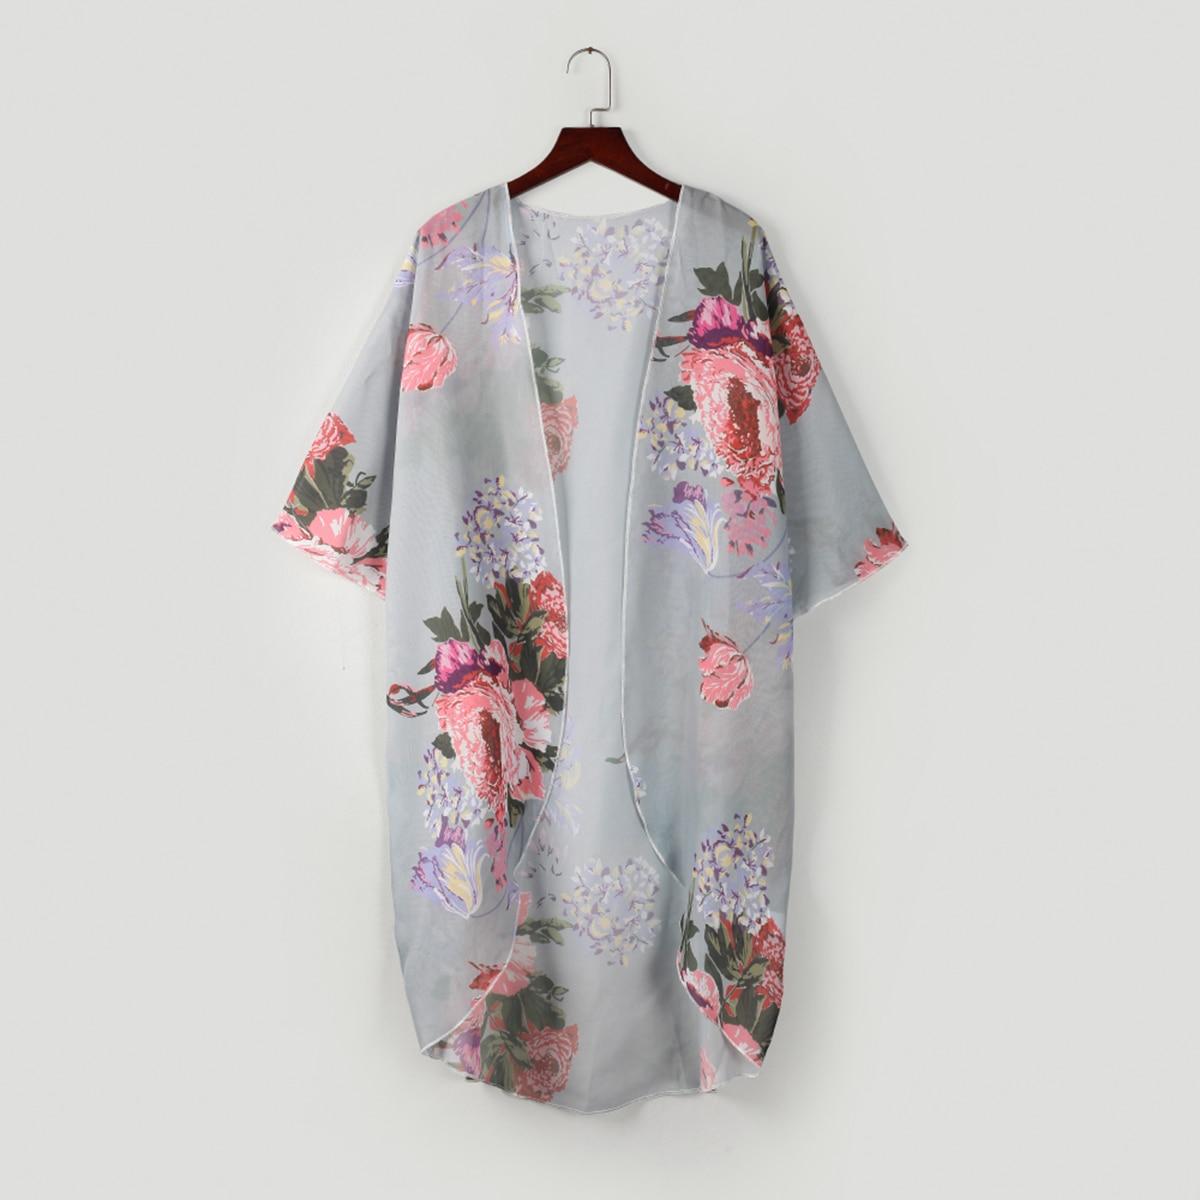 Women/'s Sleeveless Floral Lace Vest Cardigan Kimono Open Front Top S-4XL